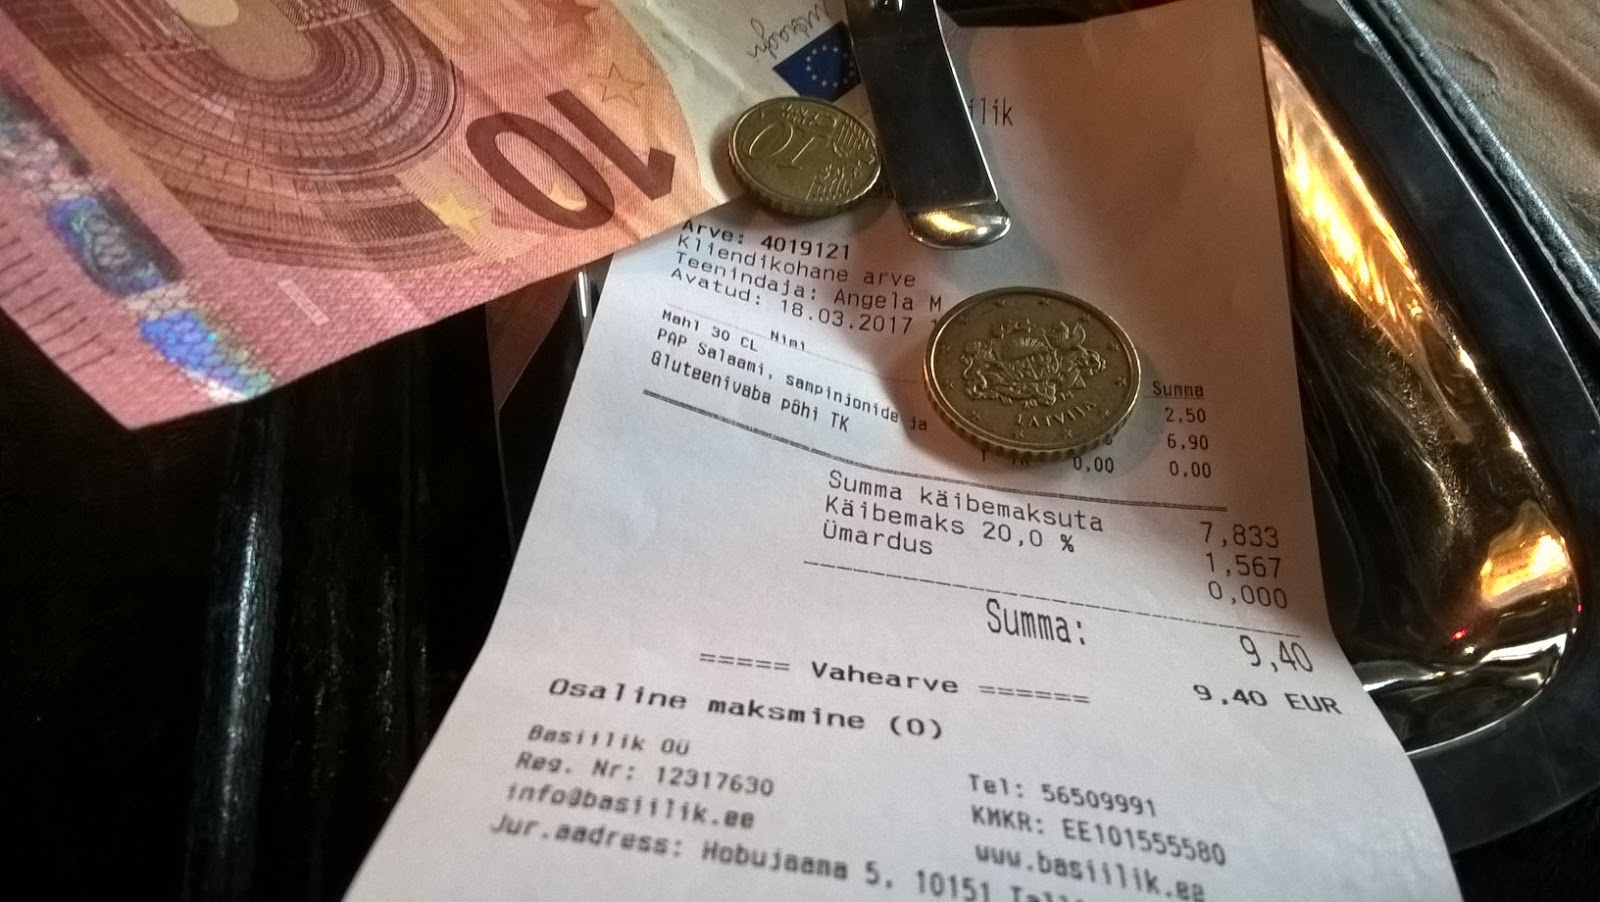 liukas vittu sadamarket hinnasto